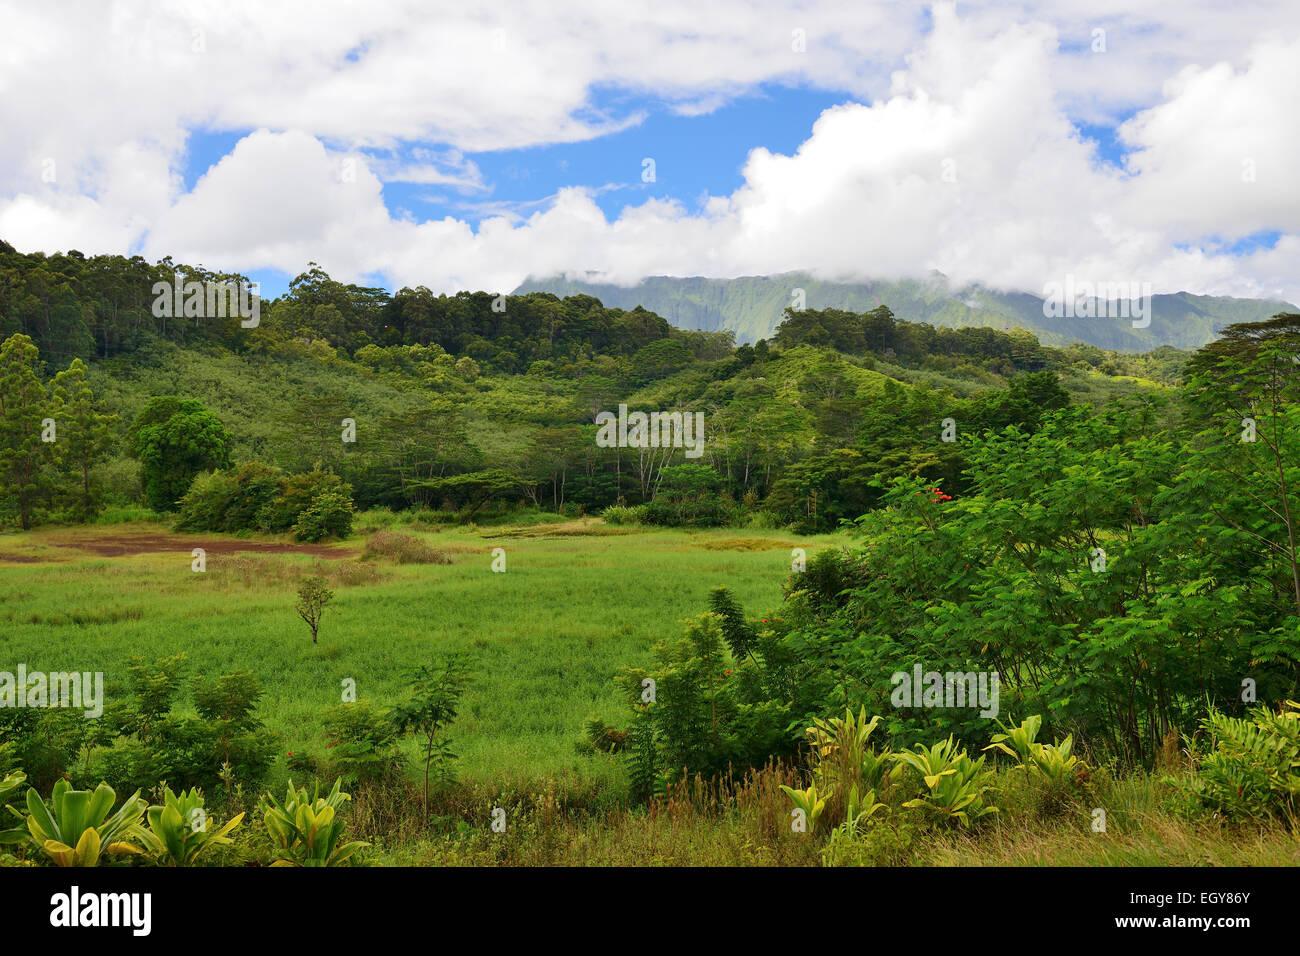 Keahua Forestry Arboretum (part of Wailua River State Park ), Kauai, Hawaii, USA - Stock Image